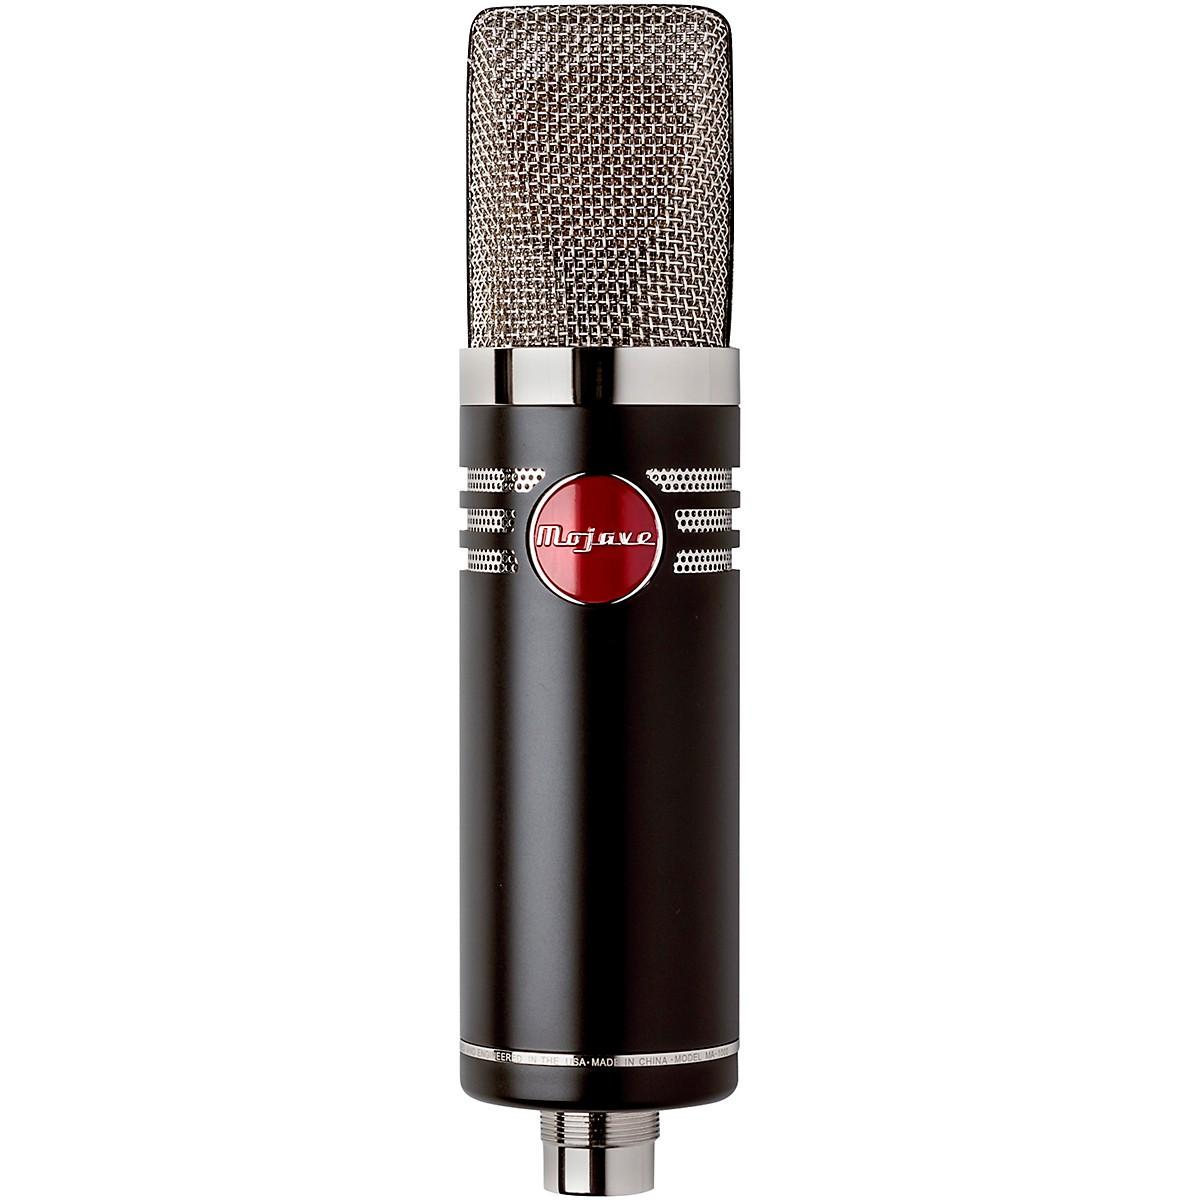 Mojave Audio MA-1000 Large Diaphragm Tube Condenser Microphone